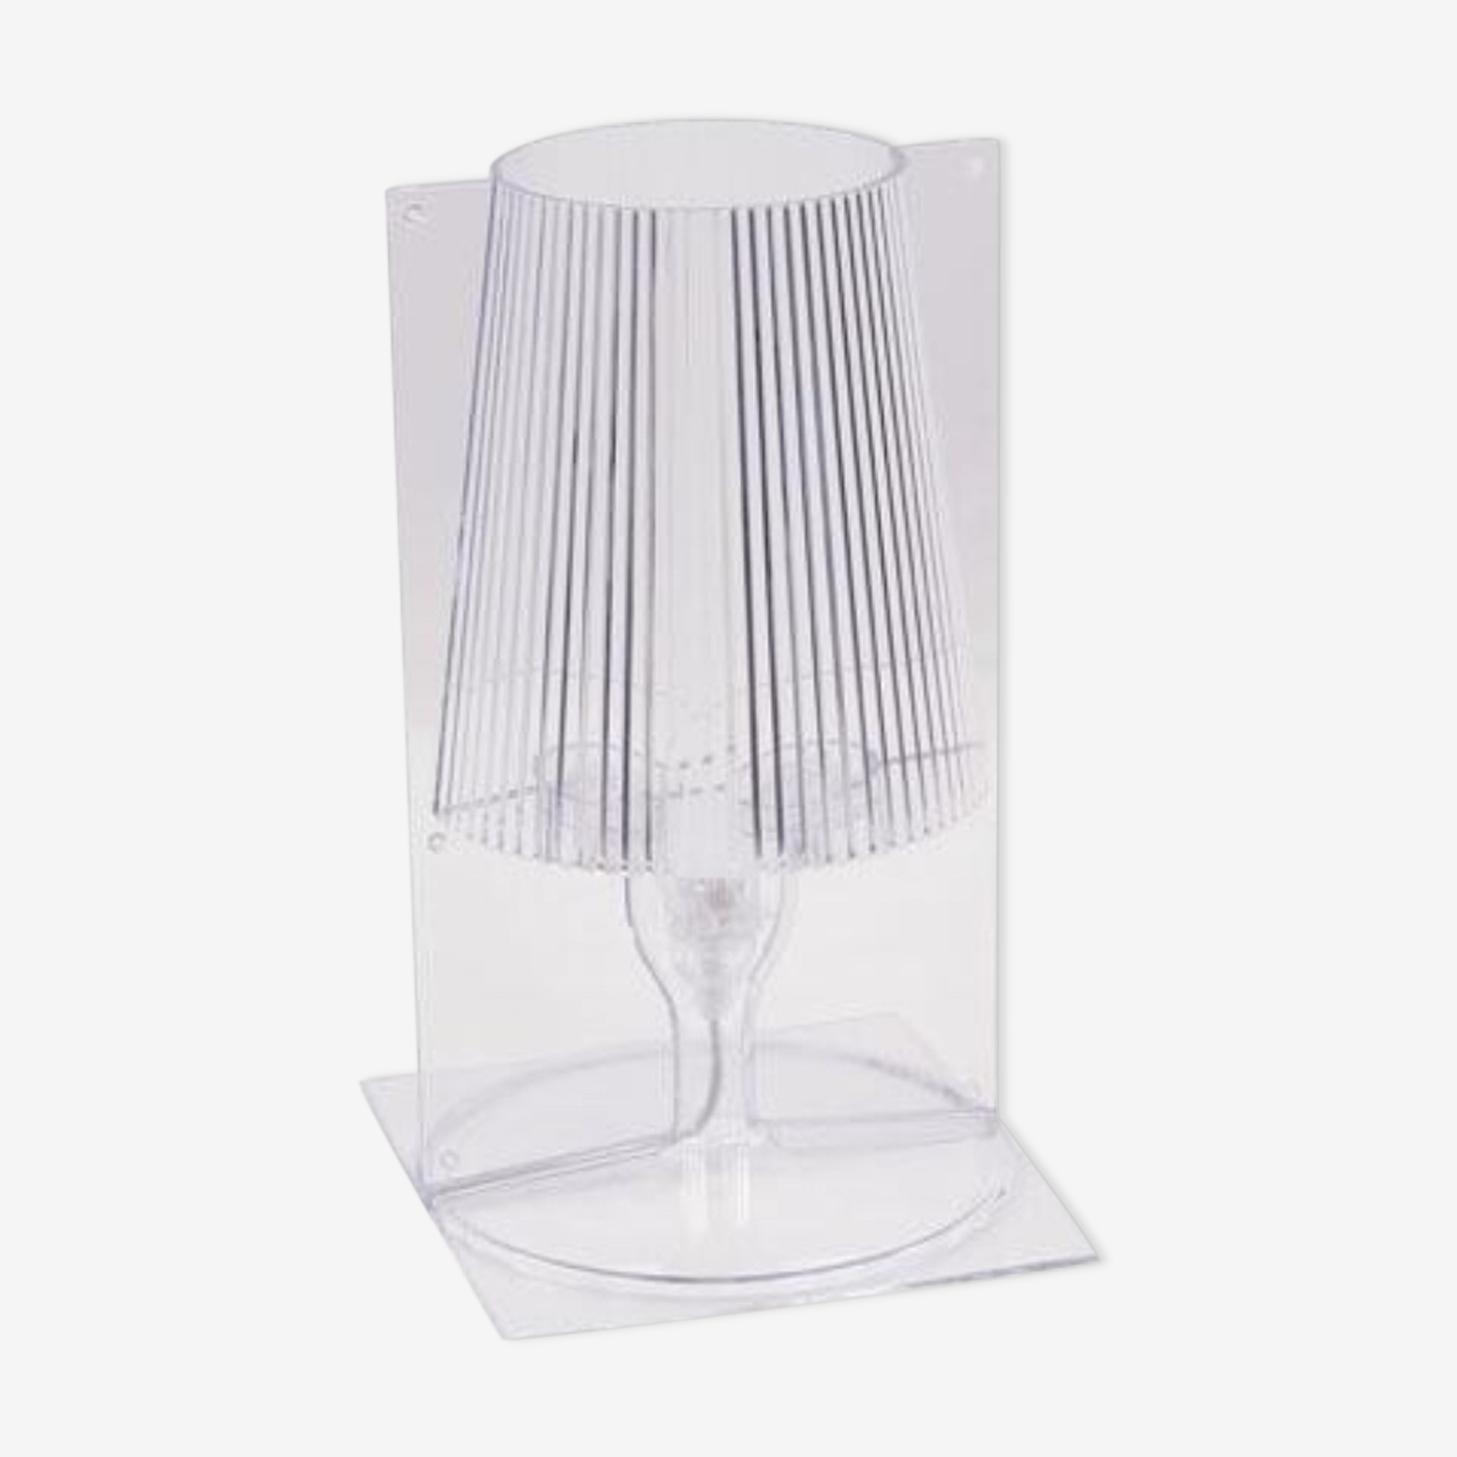 Take Ferrucio Laviani table lamp by Kartell